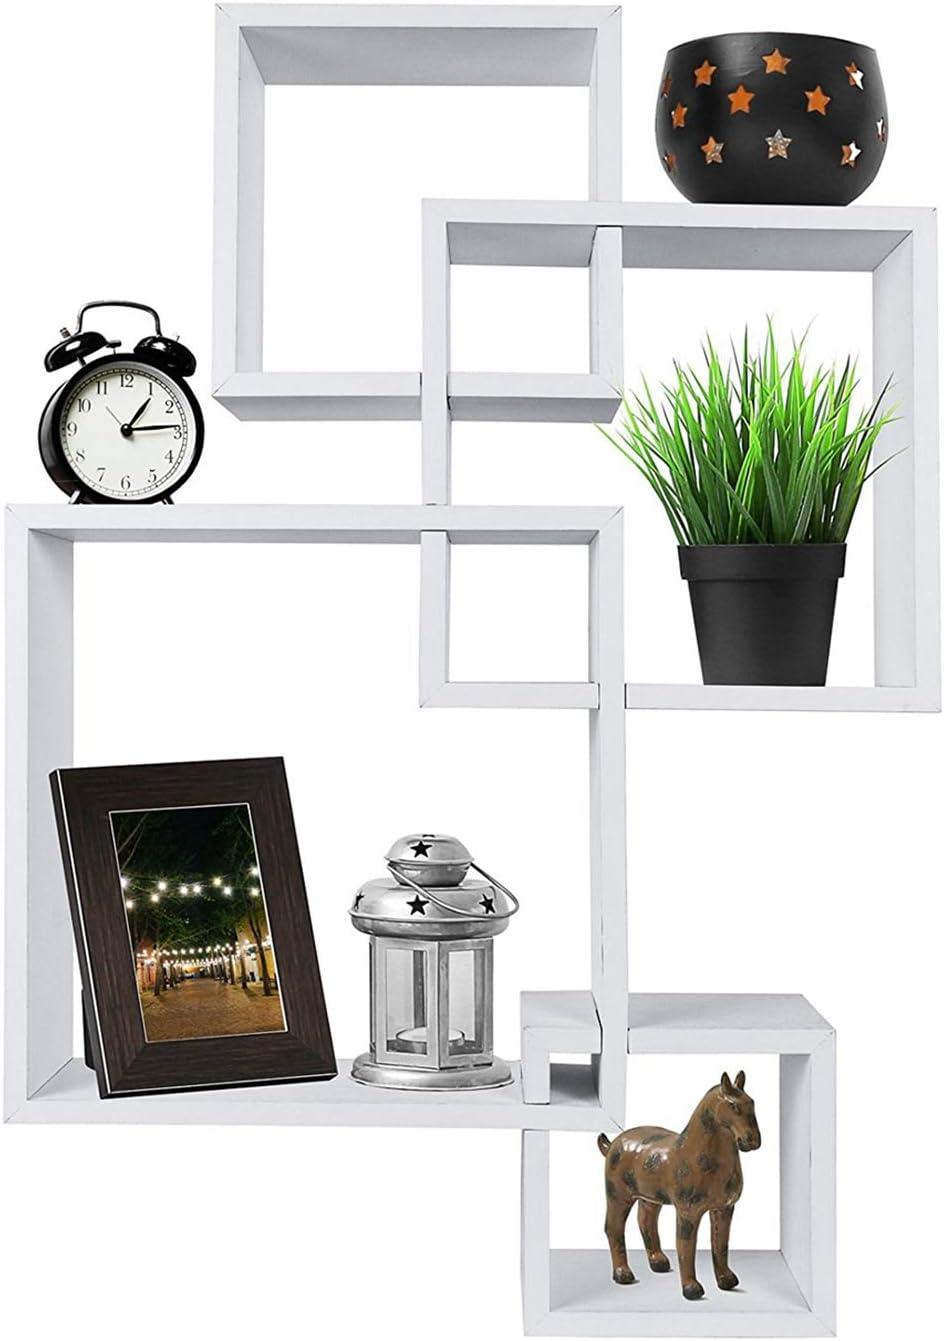 IHADA Set Luxury of 4 Intersecting Decorative Color Fl Wall White Sacramento Mall Shelf